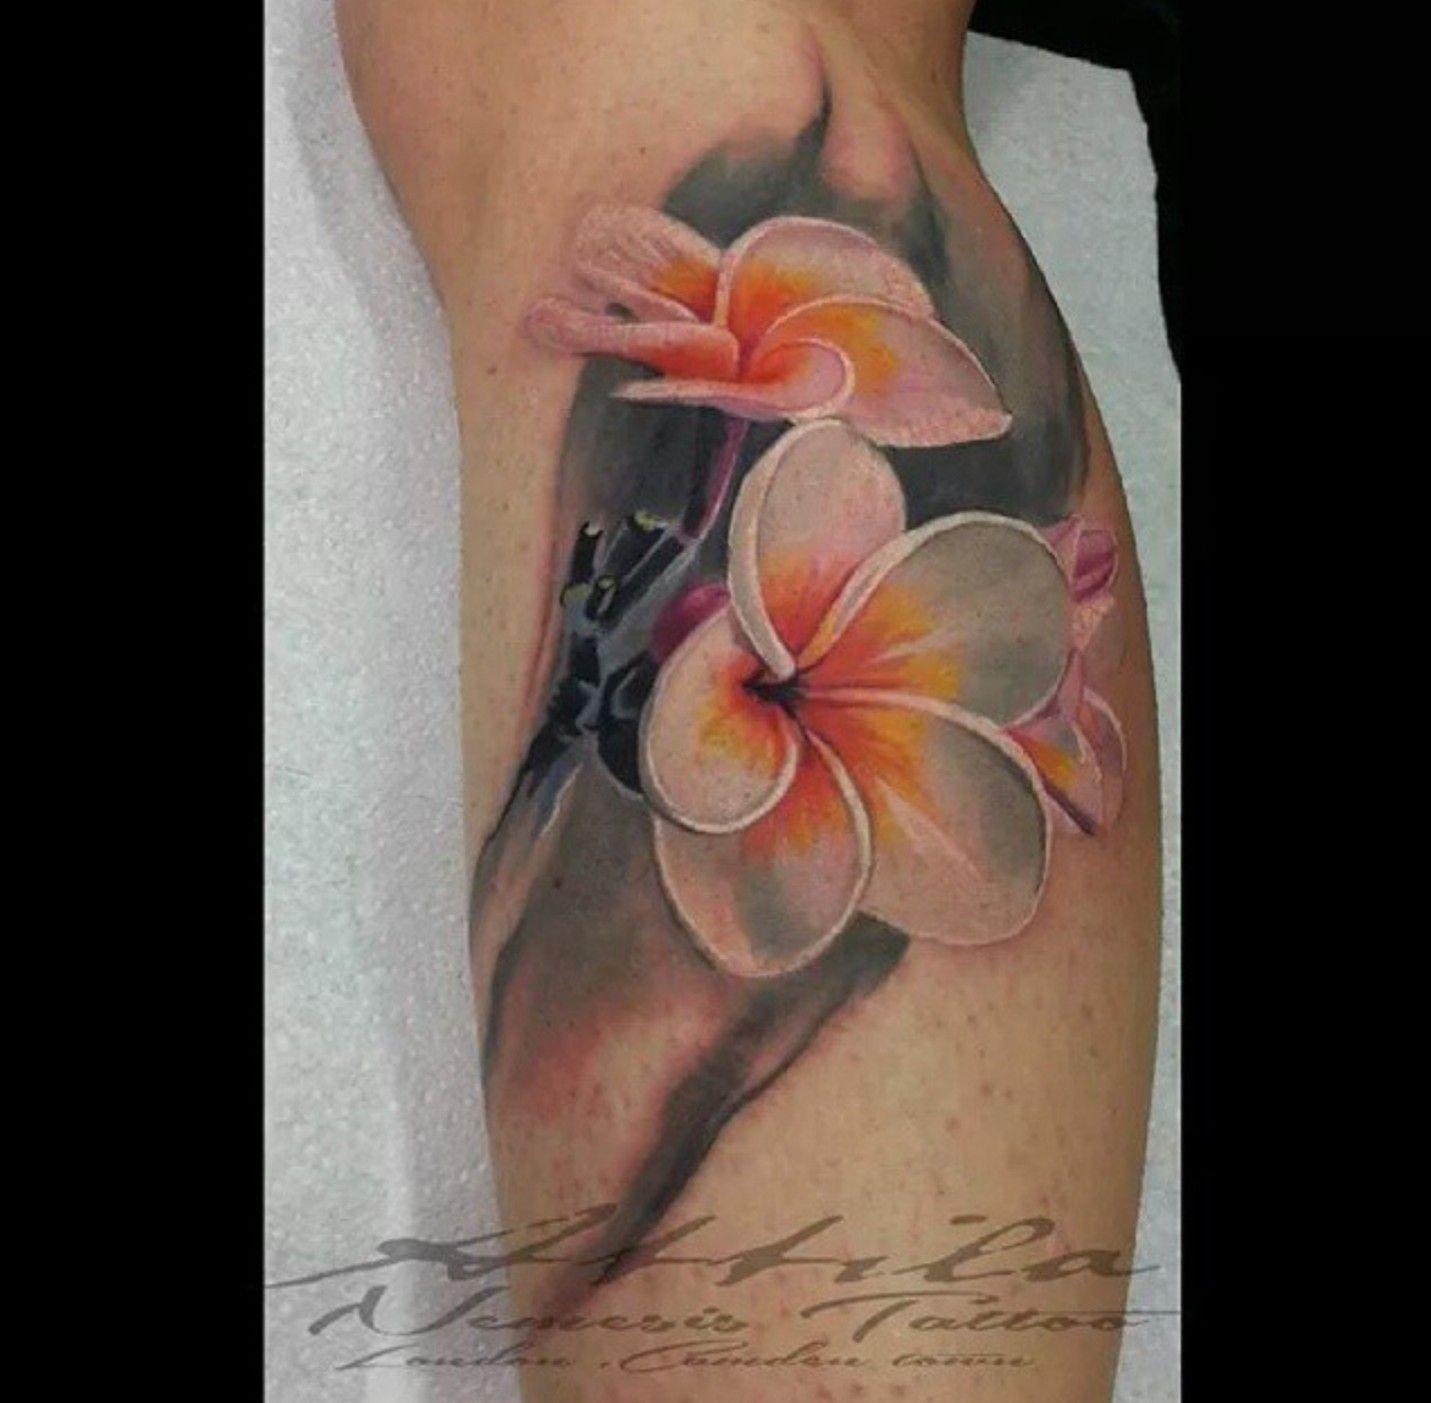 Frangipani Plumeria Flower Tattoo On Calf Plumeria Flower Tattoos Frangipani Tattoo Plumeria Tattoo